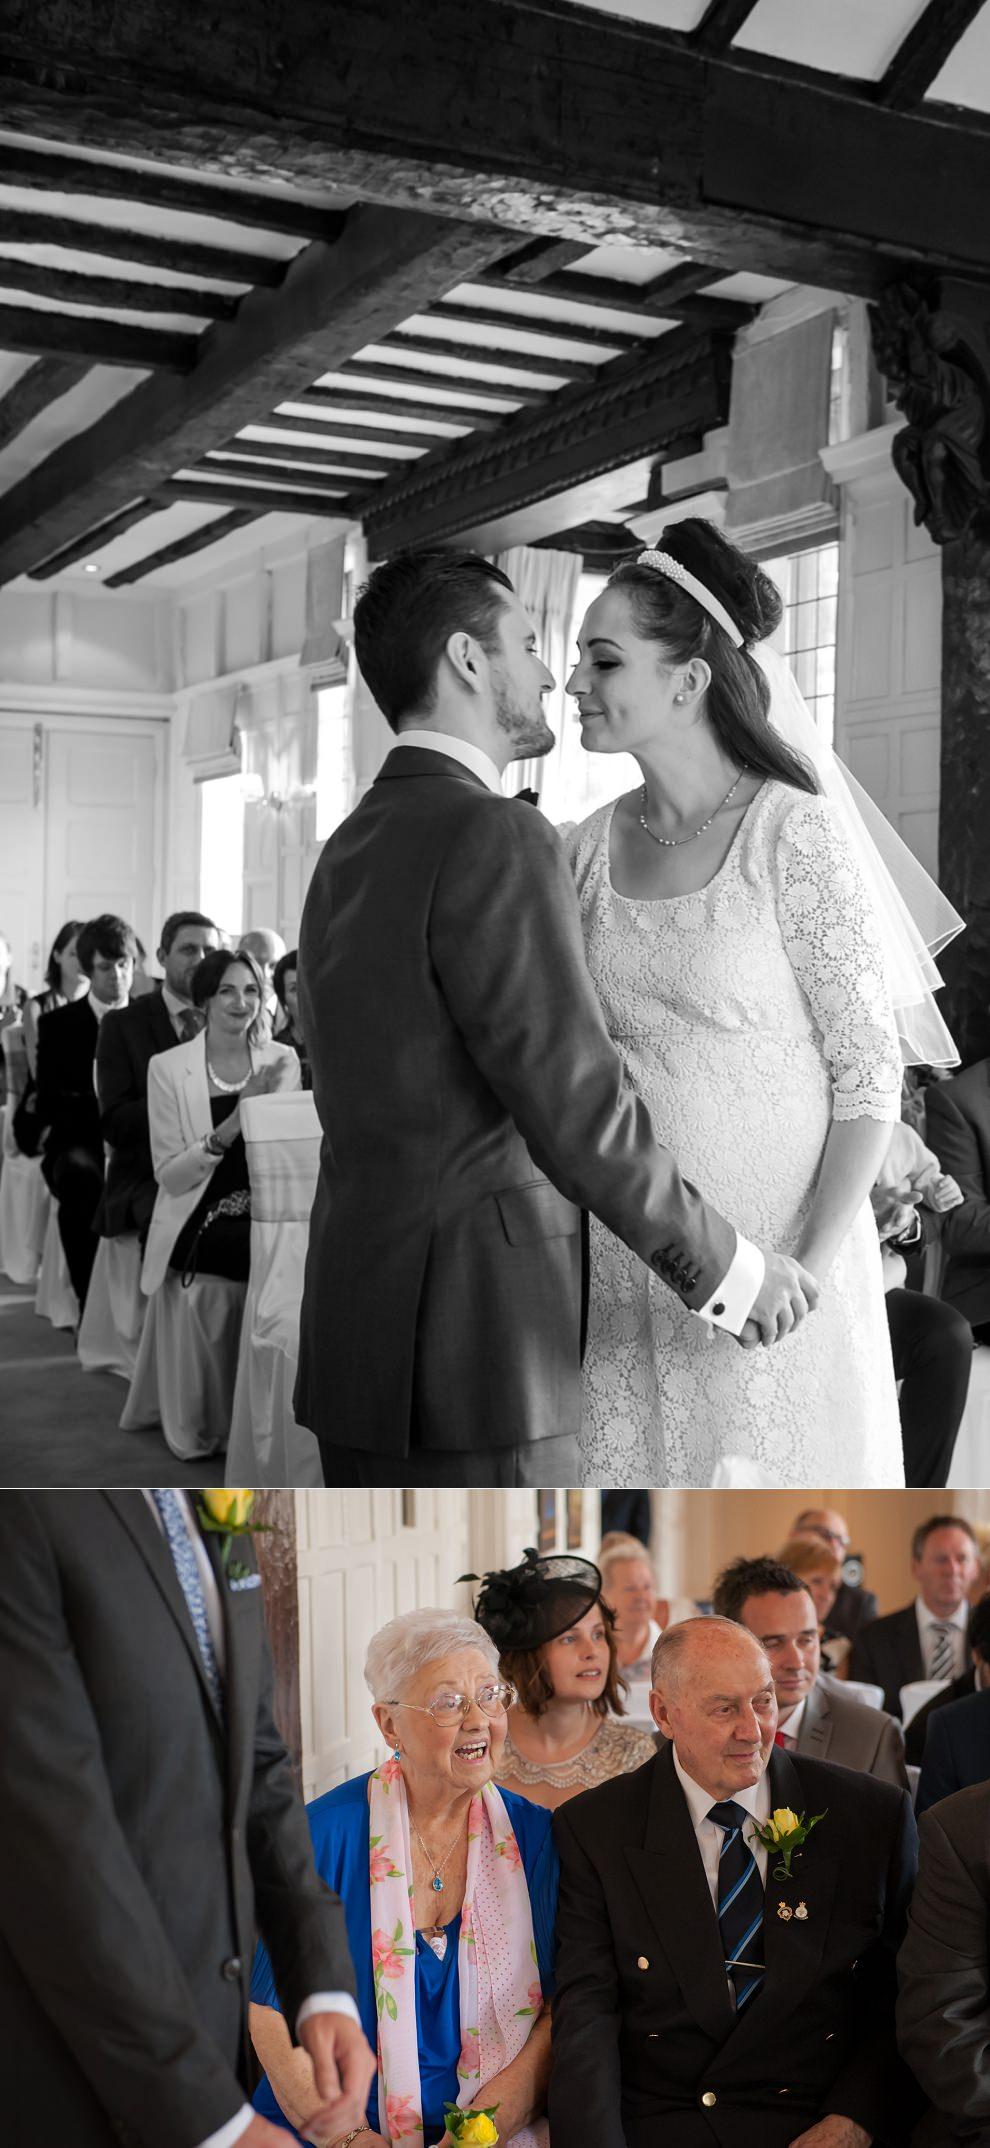 Jodie Chris Wedding Photographer Hertfordshire (5)